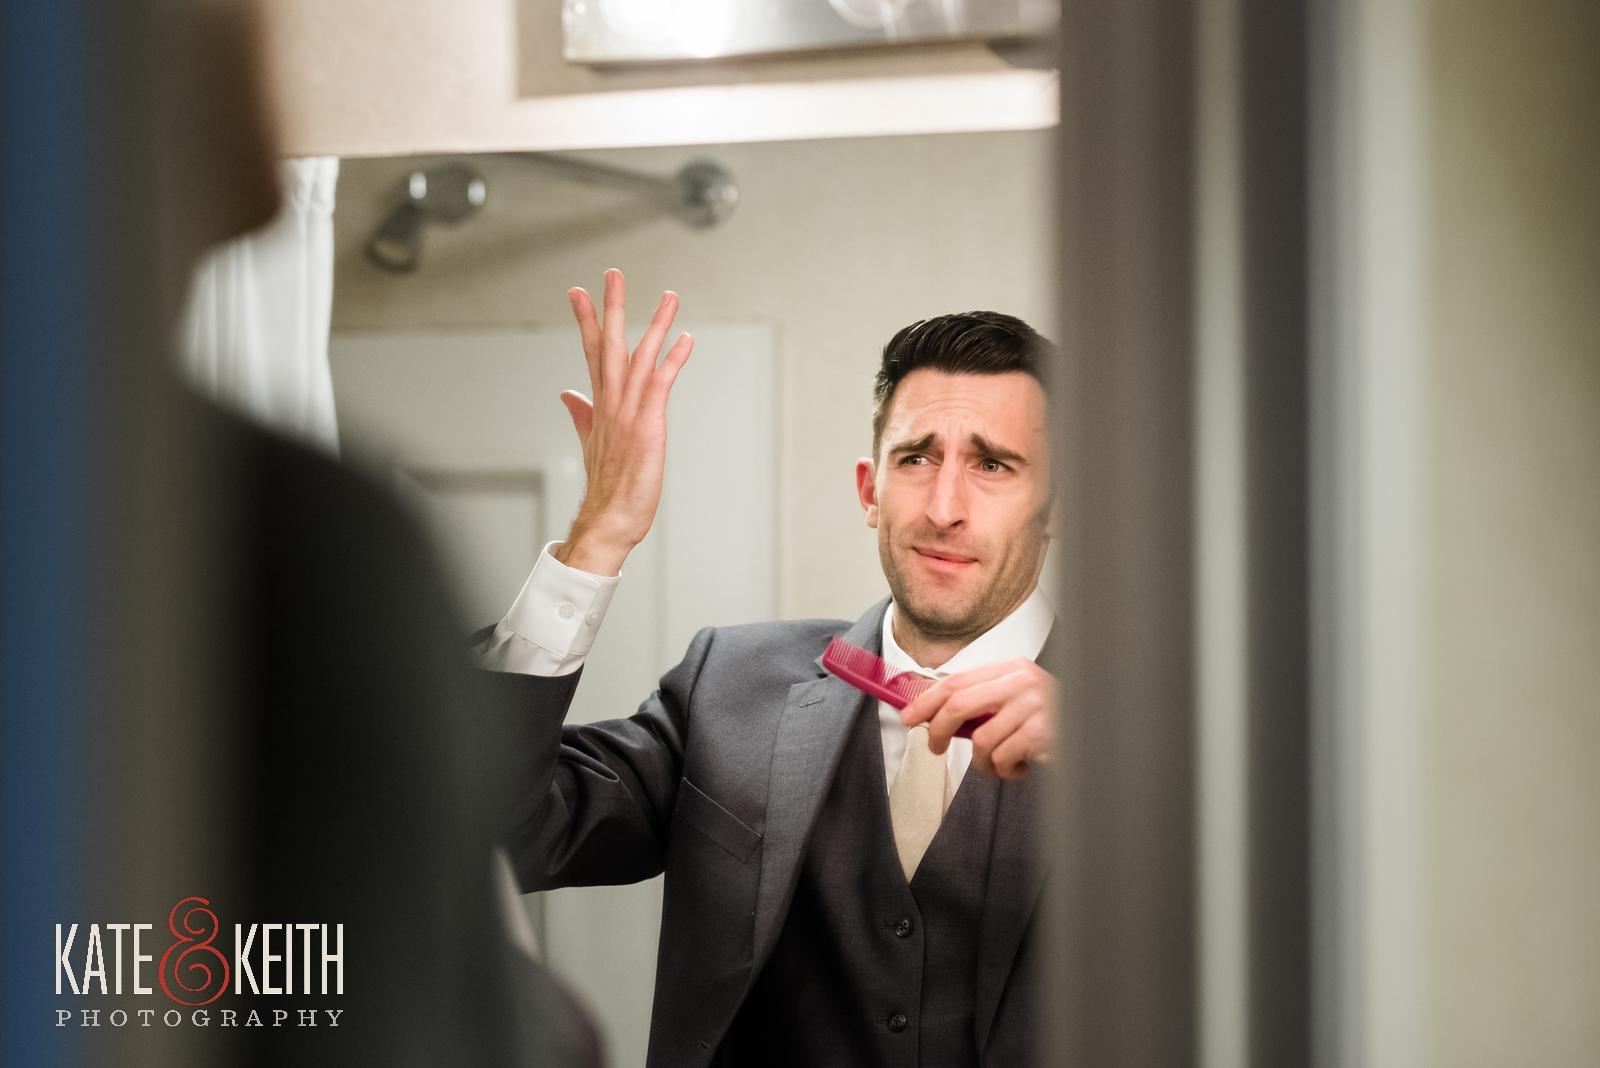 New Hampshire, Lakes Region, Lake Winnipesaukee, The Margate Resort, wedding, outdoor wedding, lakeside wedding, groomsmen, groom getting ready, grooms attire